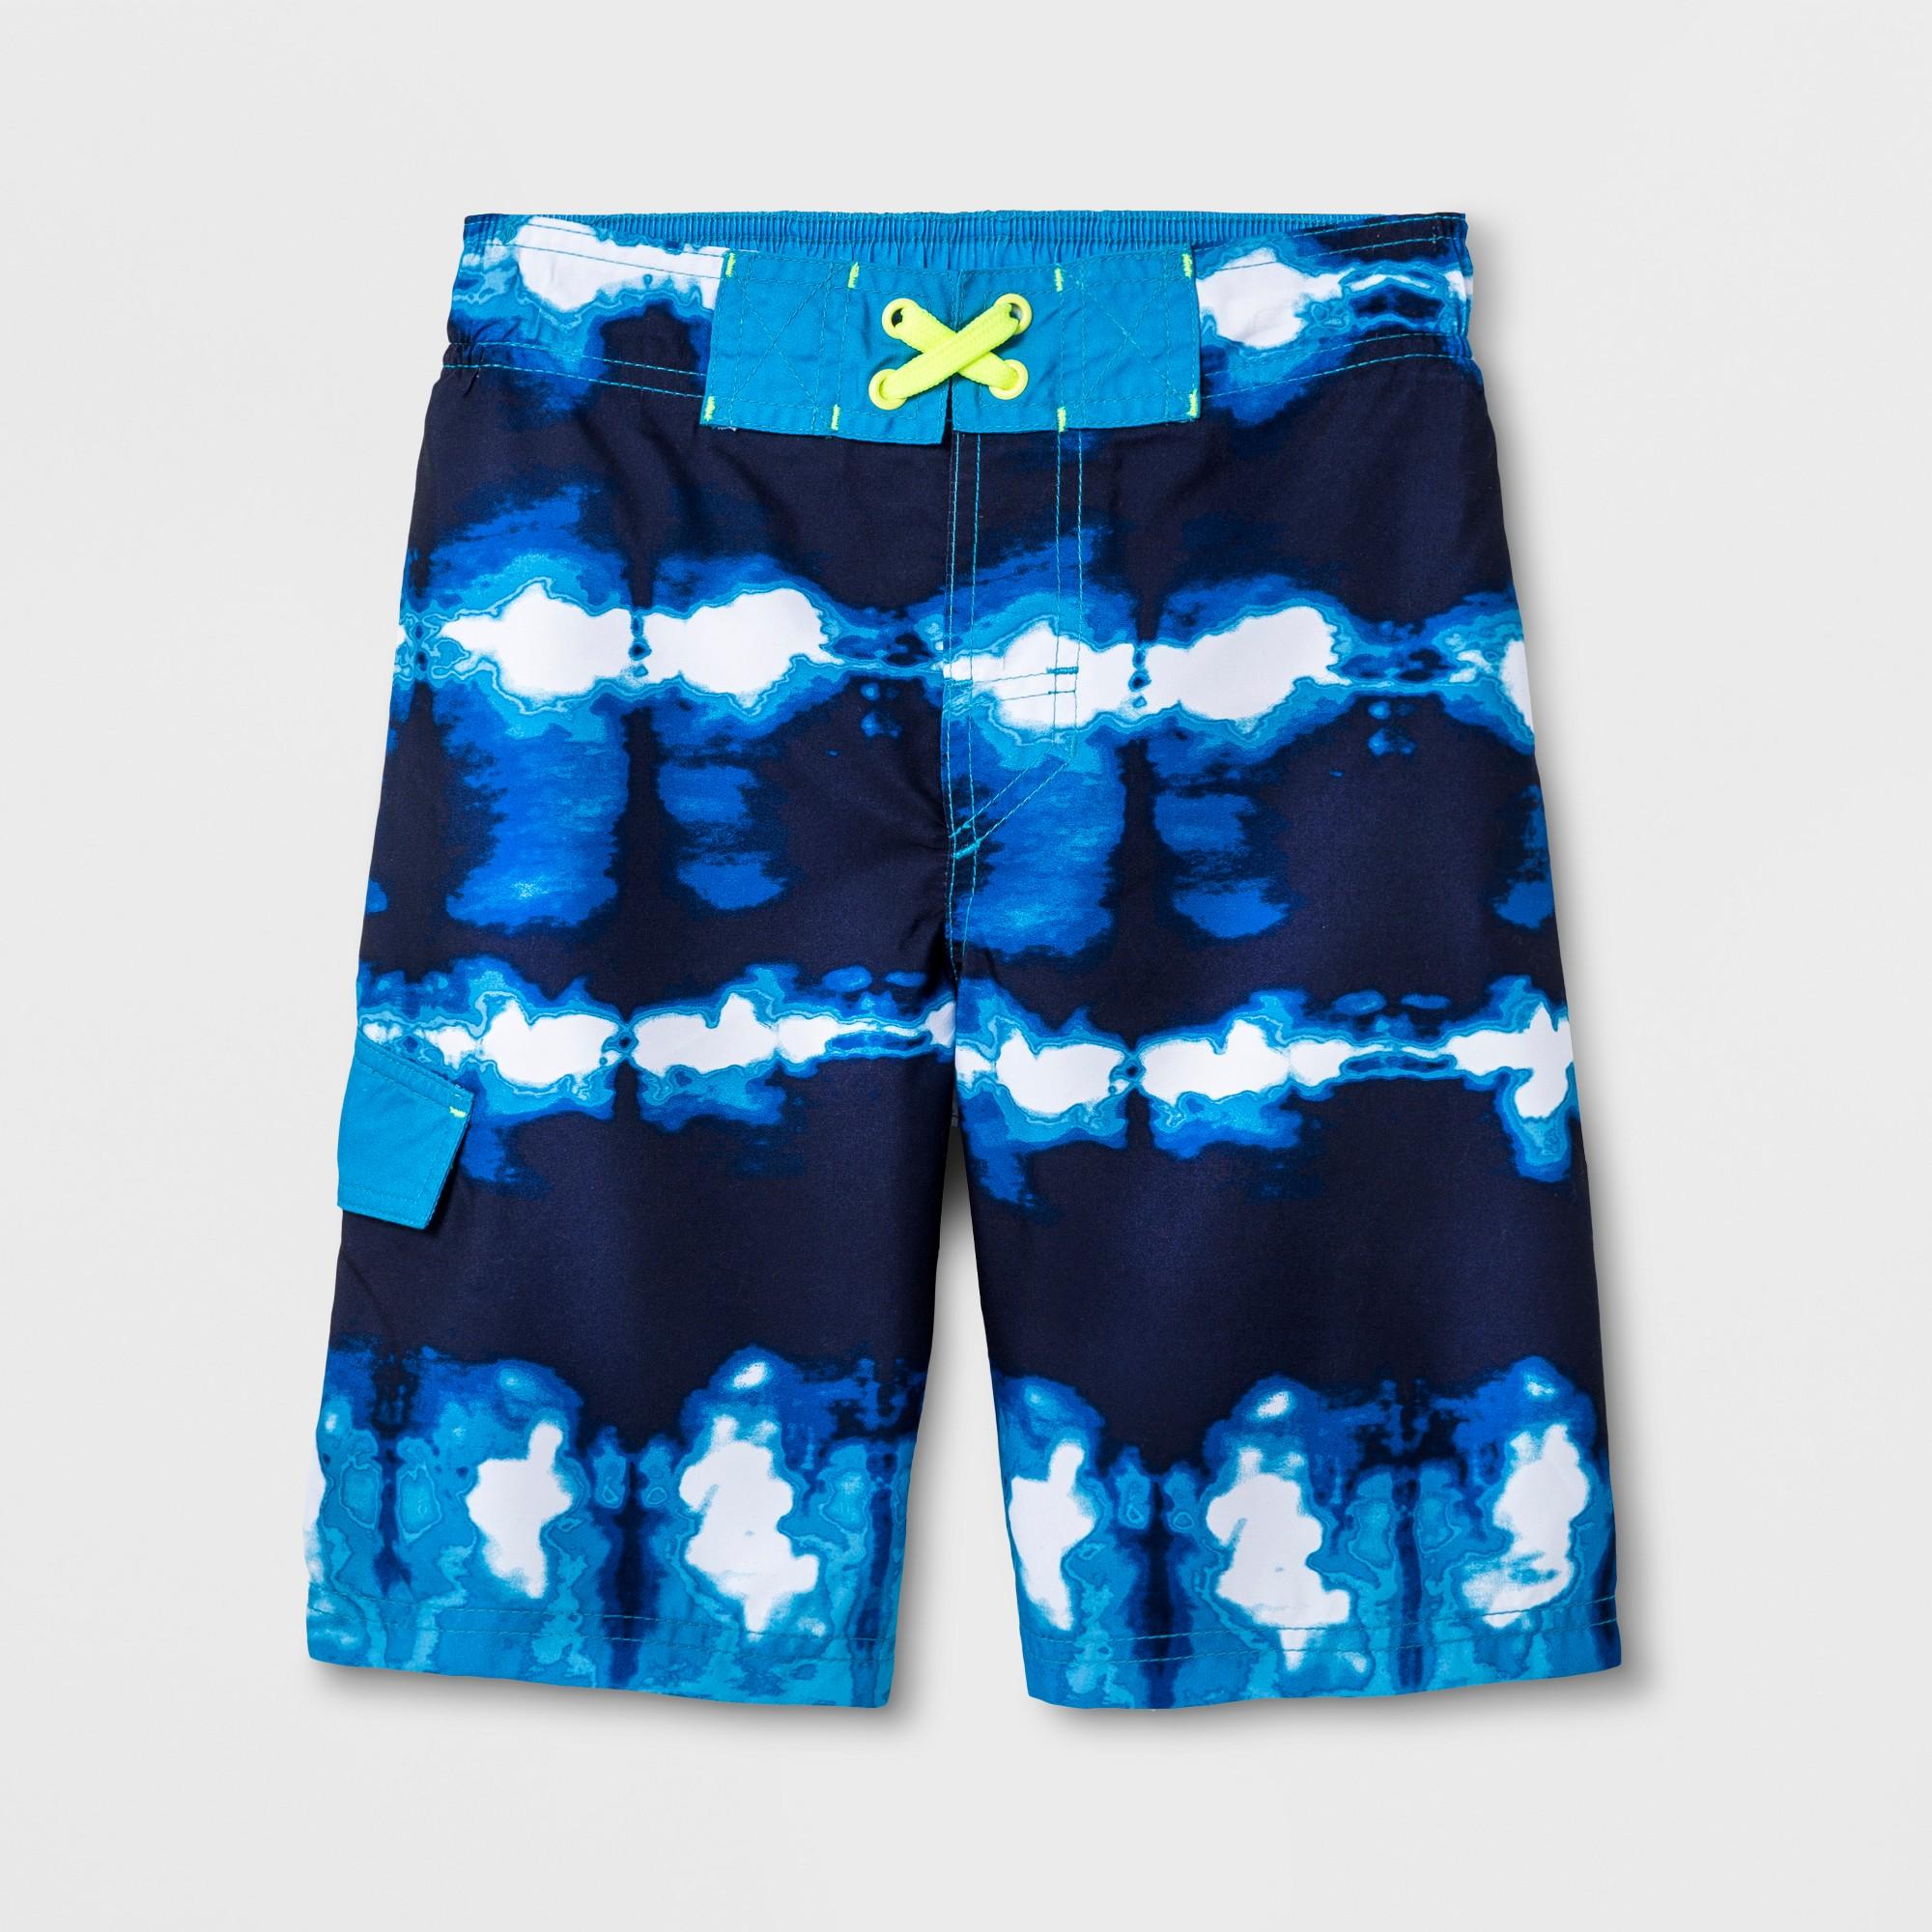 ba3d2f73e1 Boys' Swim Trunk - Cat & Jack Navy L, Blue | Products | Swim trunks ...